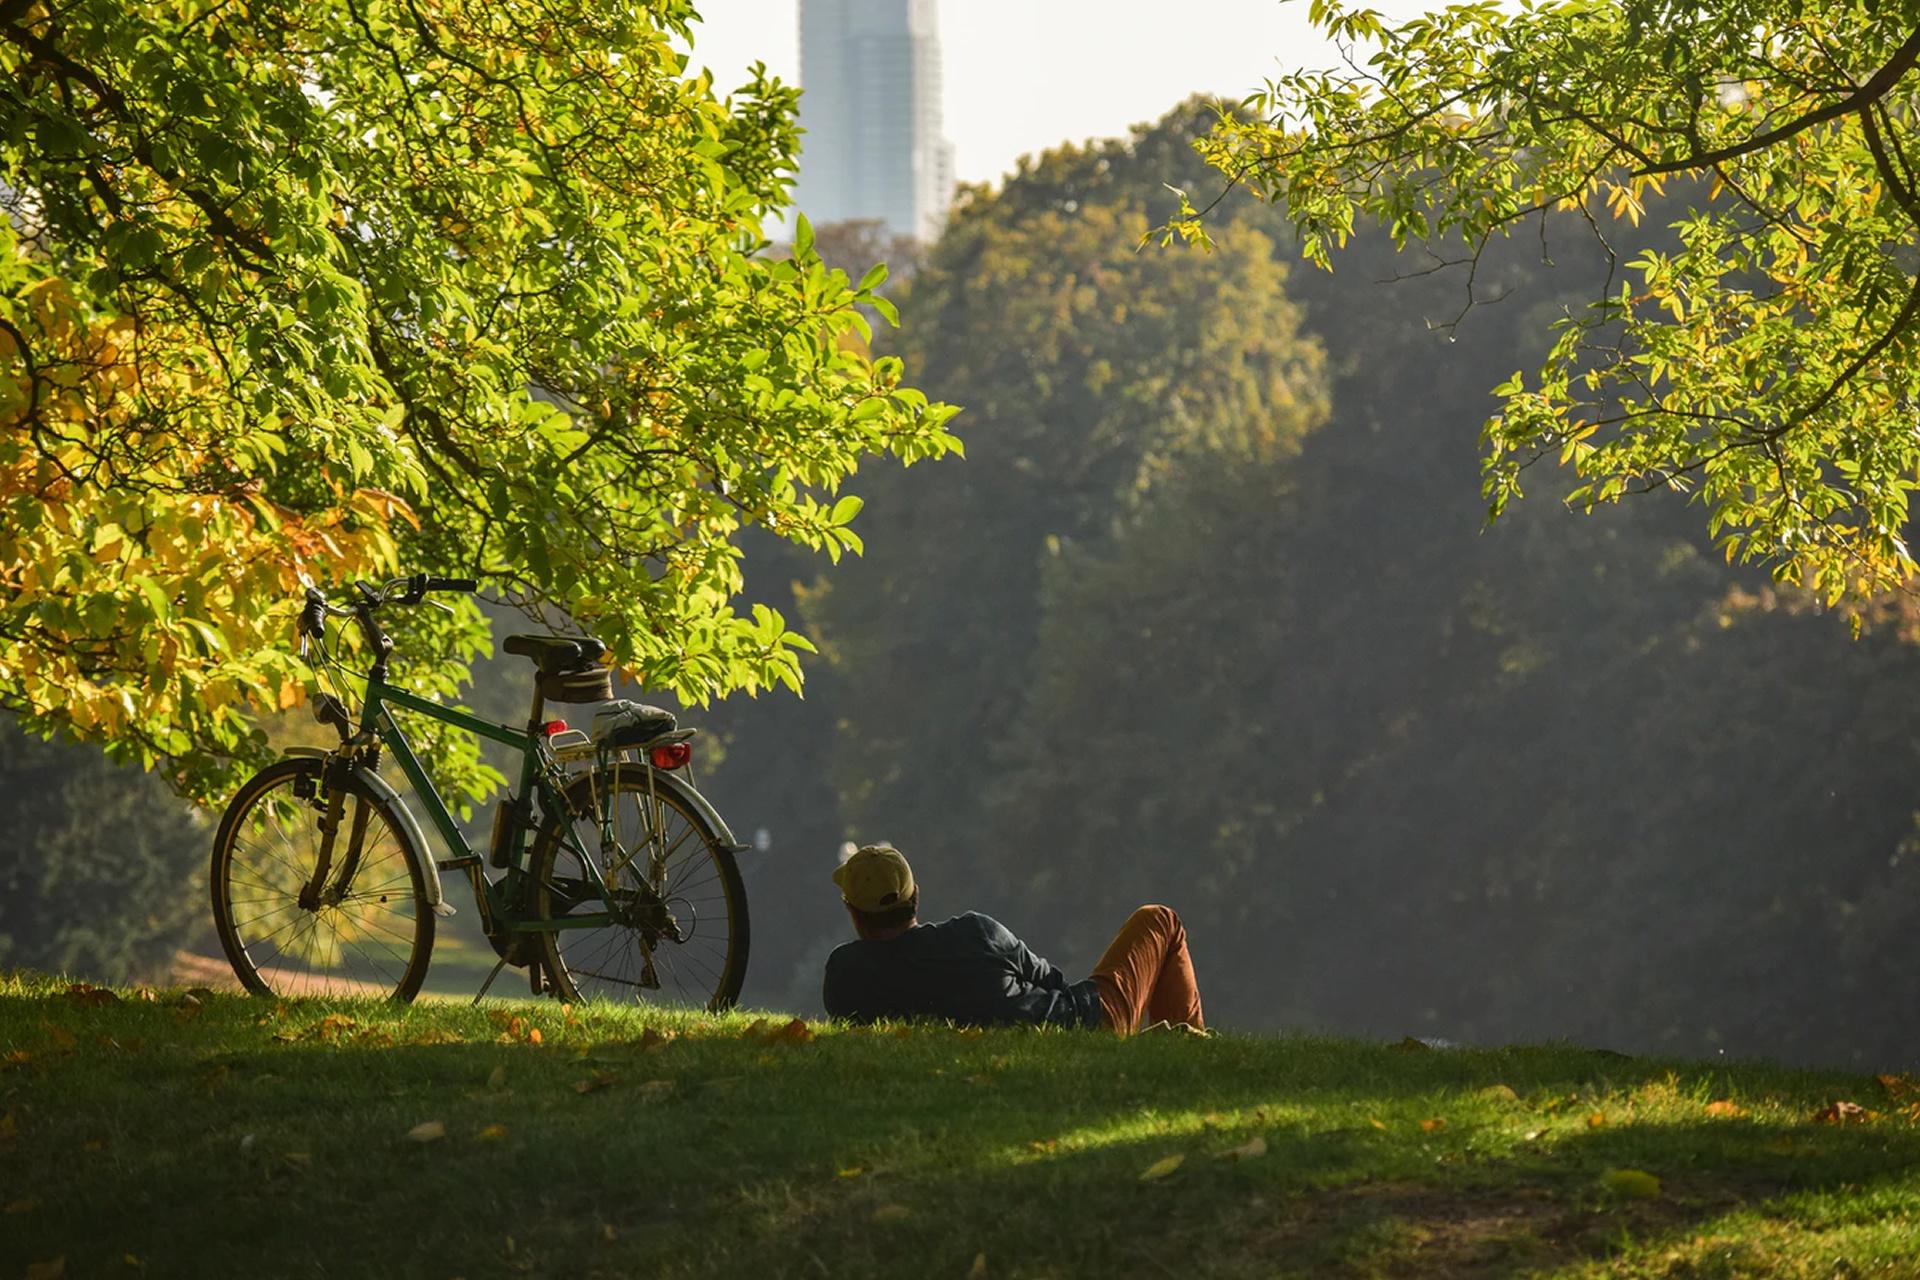 Mit dem Fahrrad im Park